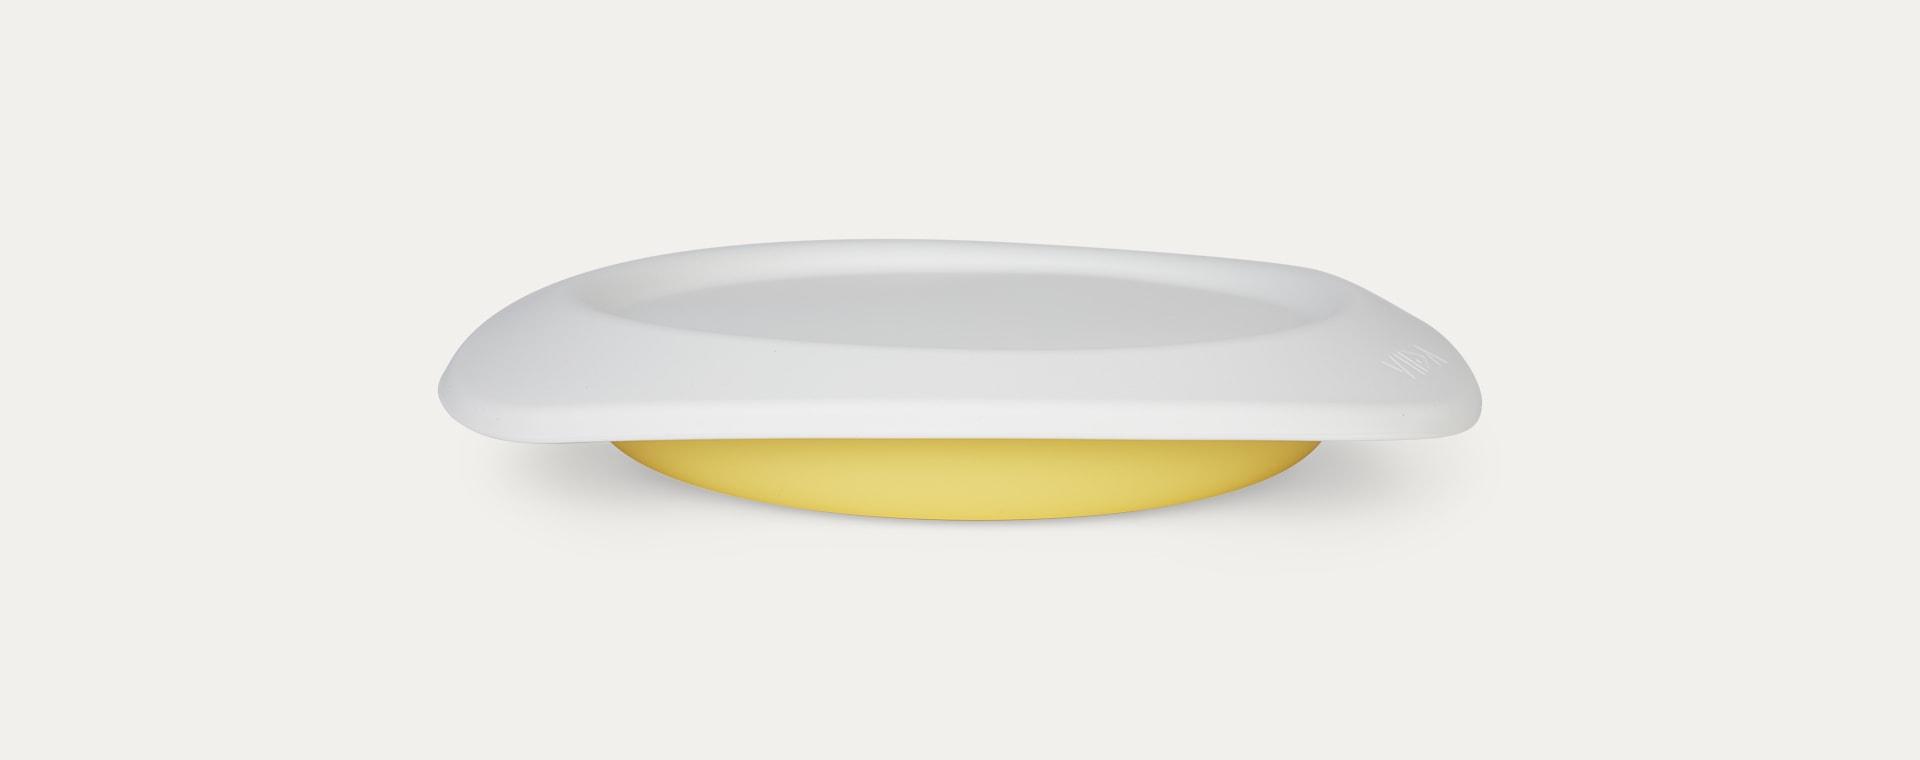 Lemon Yellow VIIDA Soufflé Antibacterial Stainless Steel Plate